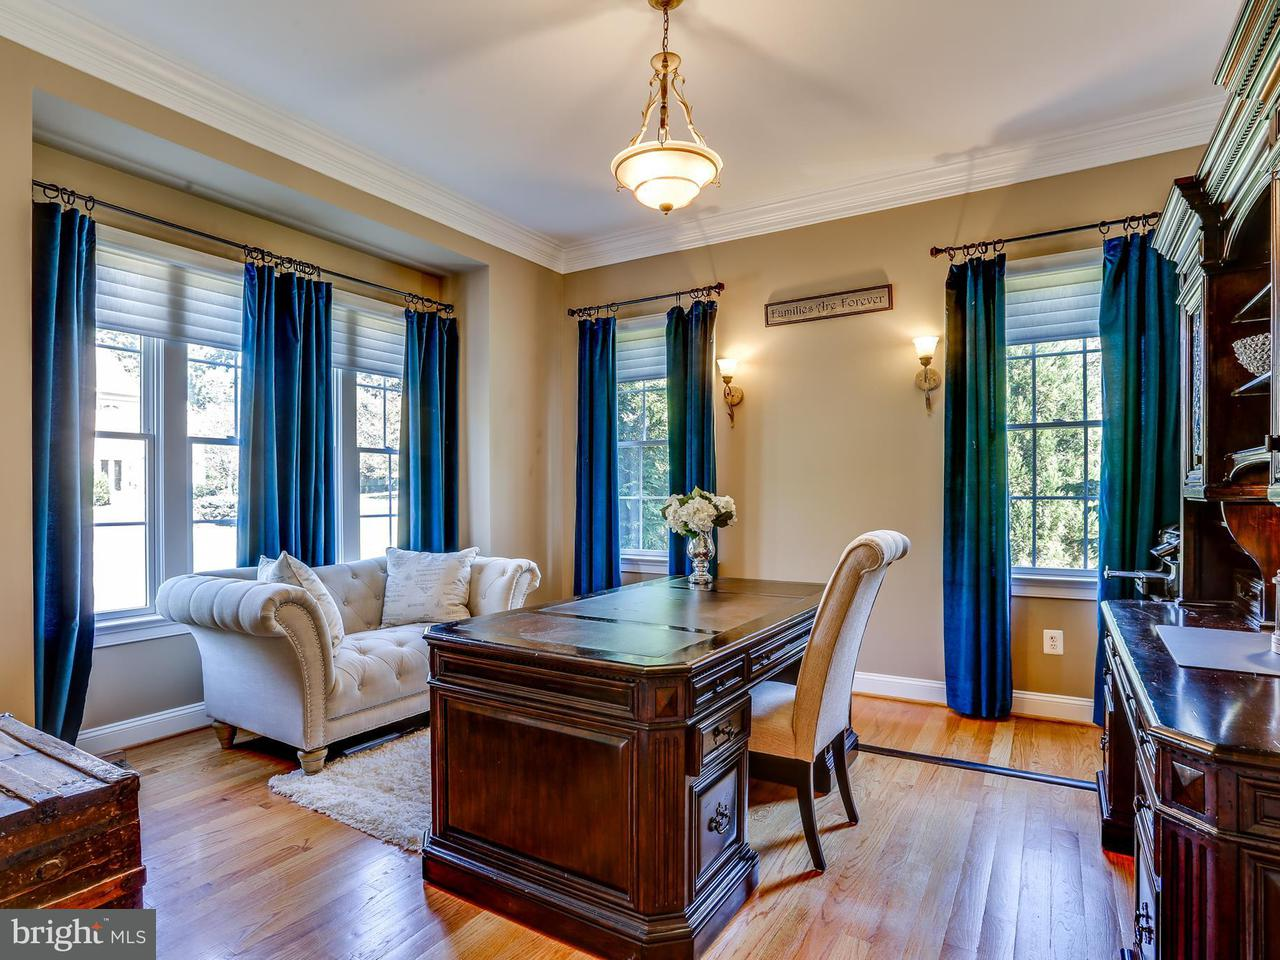 Single Family Home for Sale at 3223 HUNTERSWORTH 3223 HUNTERSWORTH Glenwood, Maryland 21738 United States